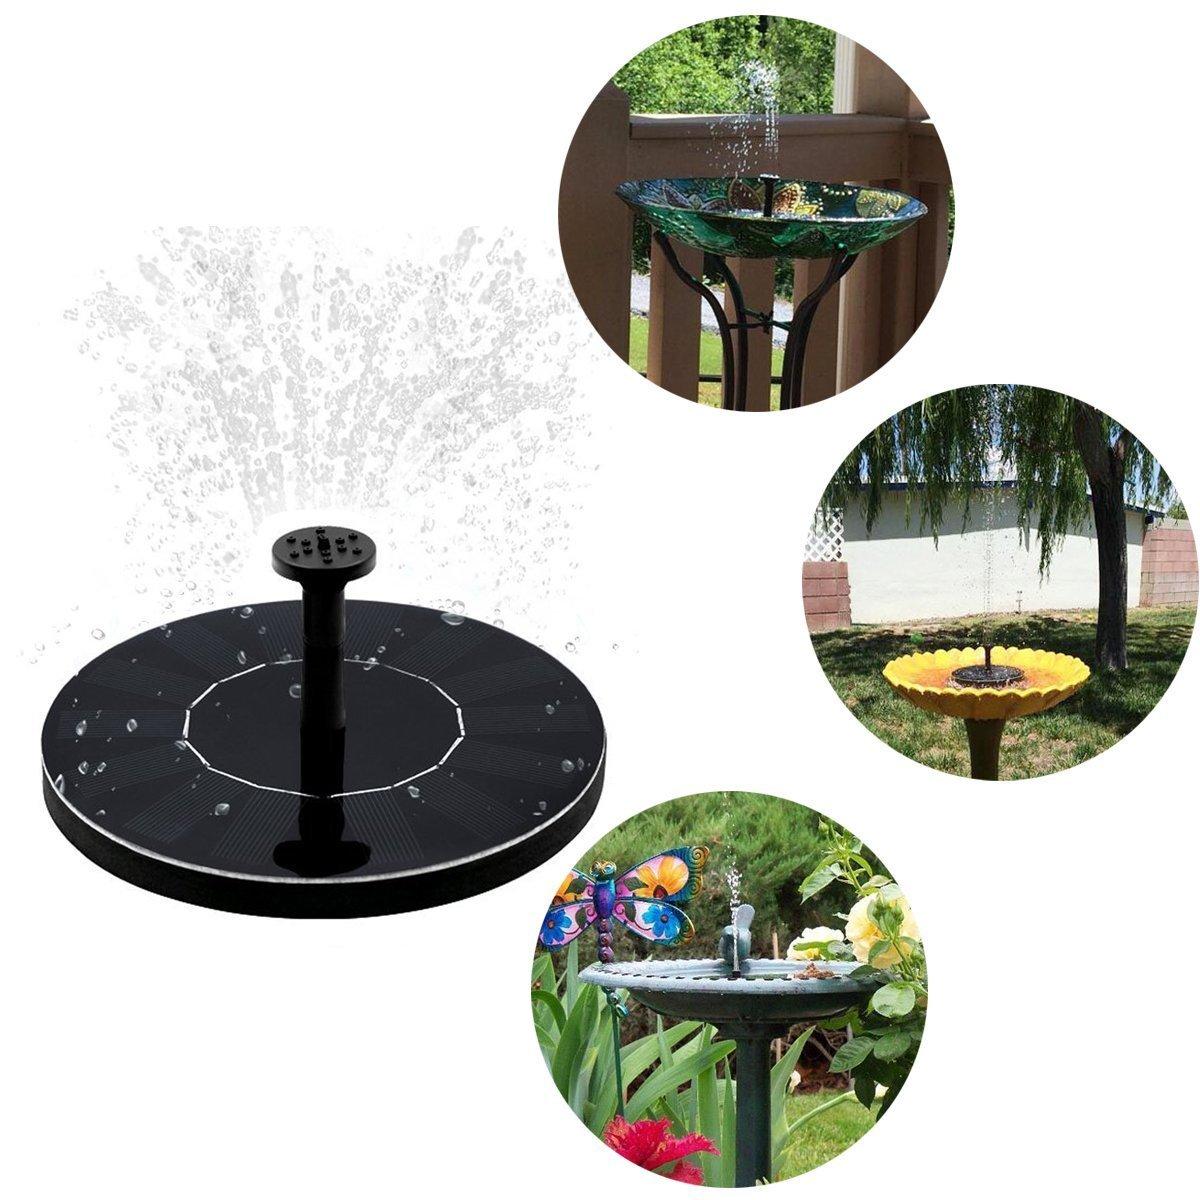 Peralng Mini Solar Powered Floating Fountain Pool Water Pump Garden Plants Water With 3 Different Spray Heads For Bird Bath Walmart Com Walmart Com